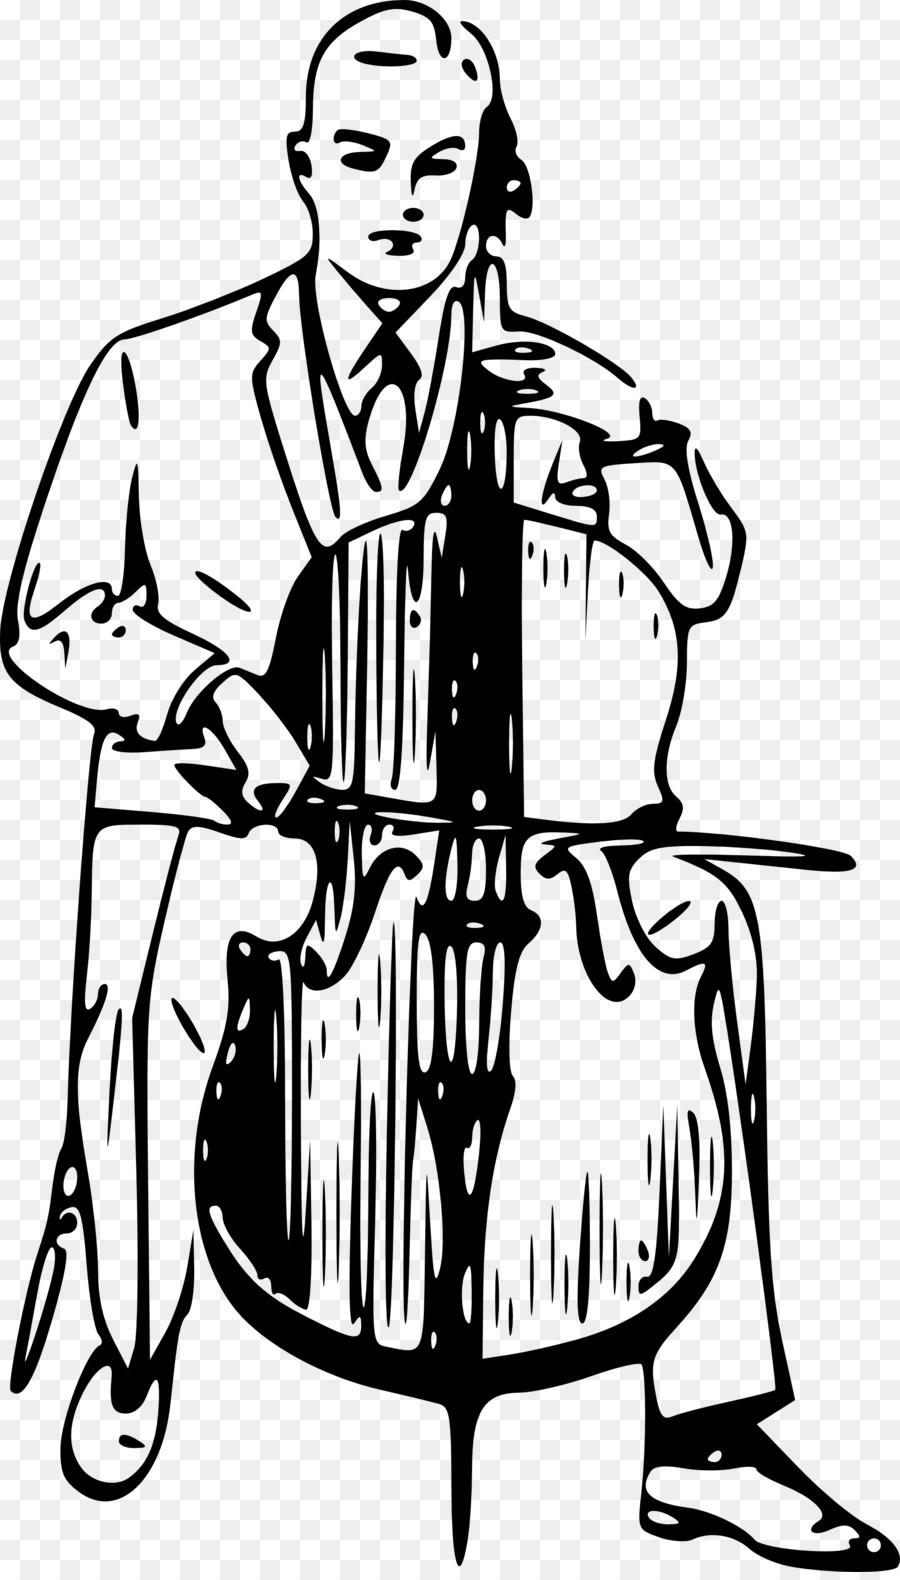 Violin cartoon drawing illustration. Cello clipart cello player